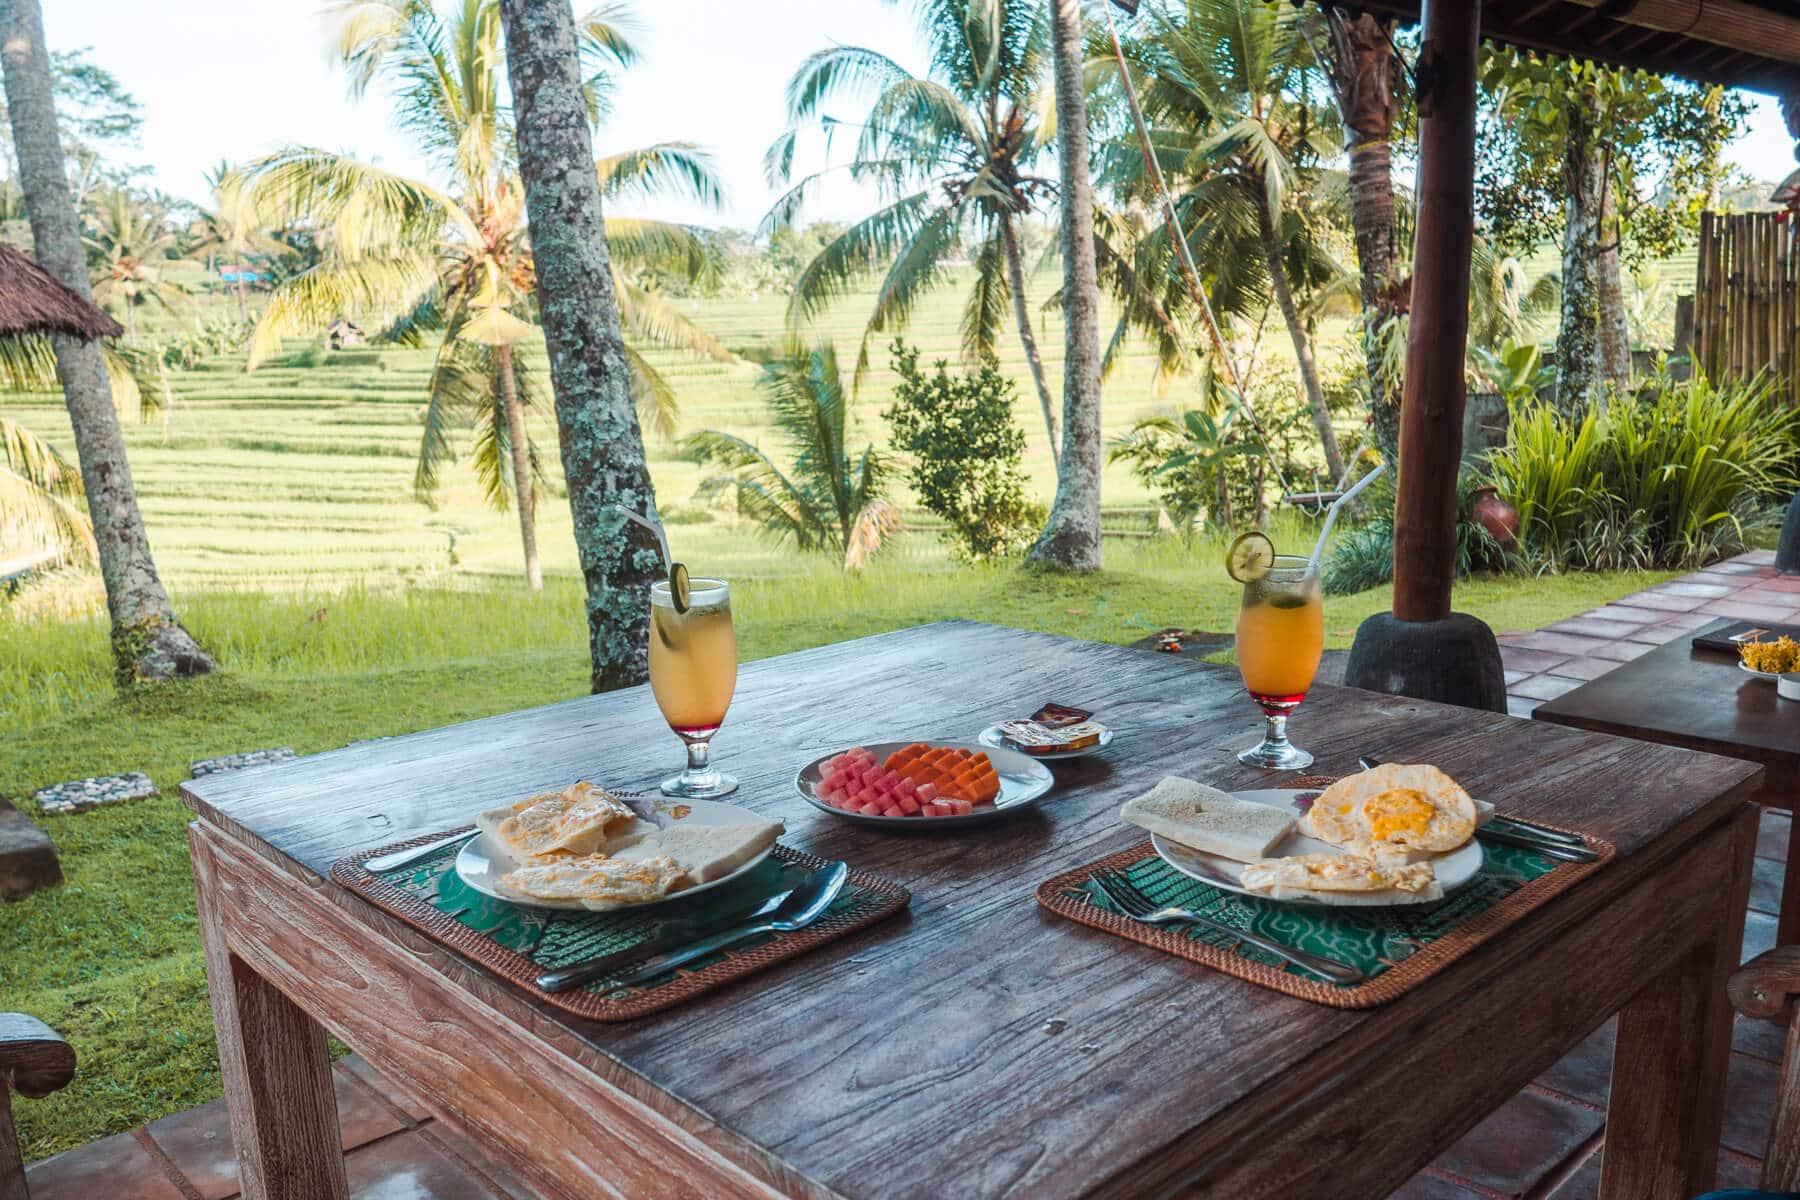 Island Life #4 - Breakfast in our garden overlooking the rice fields in Ubud